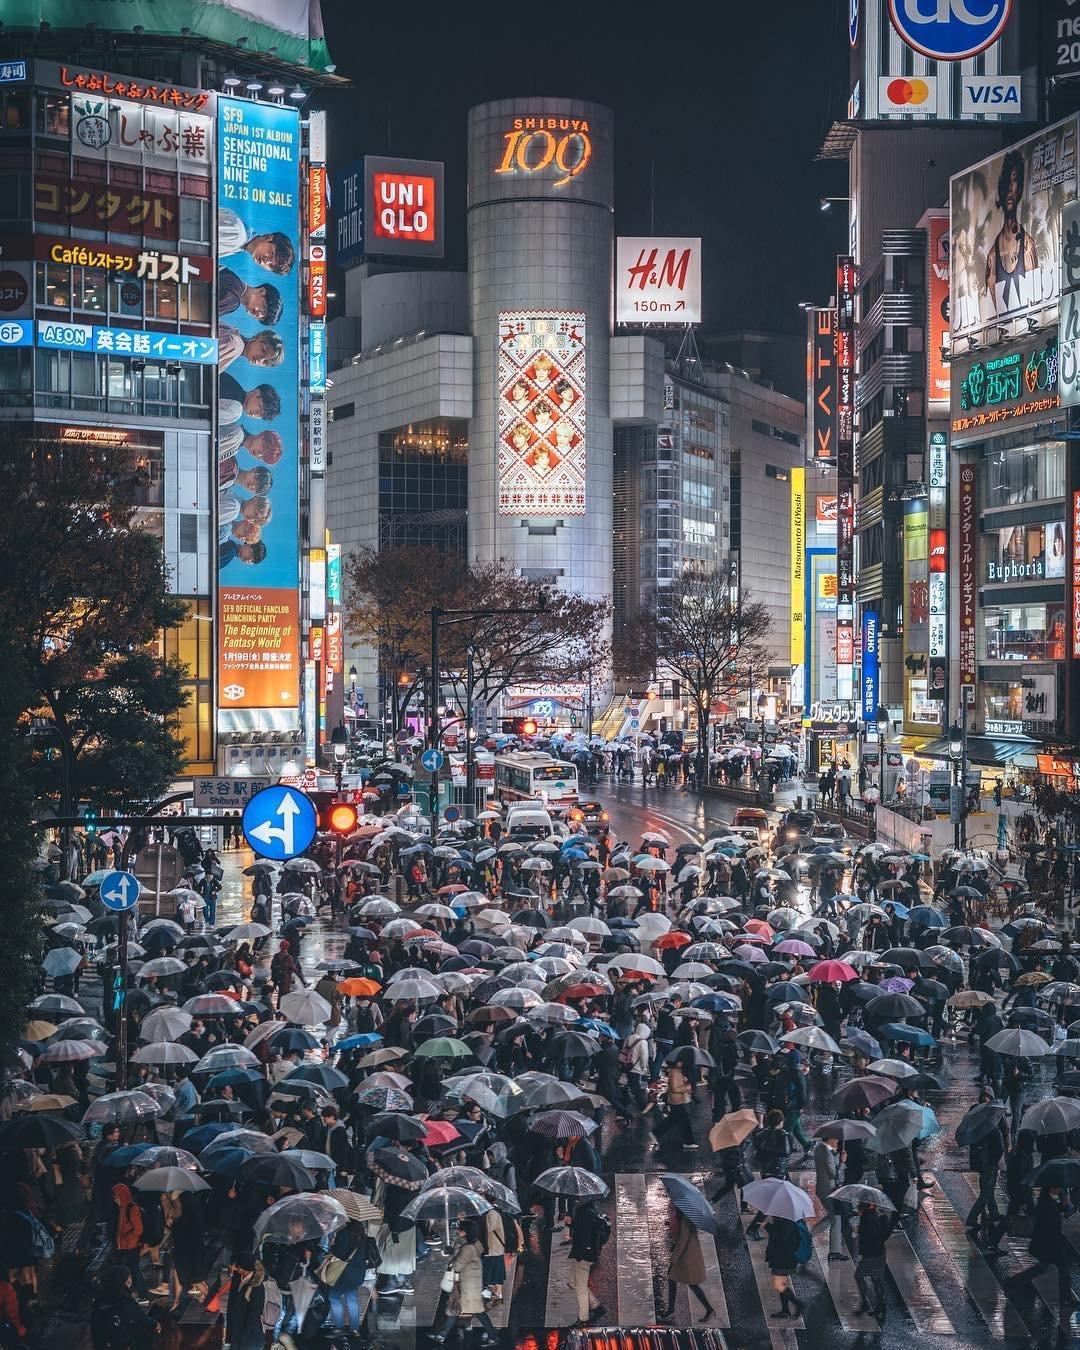 Улицы Токио на снимках от RK